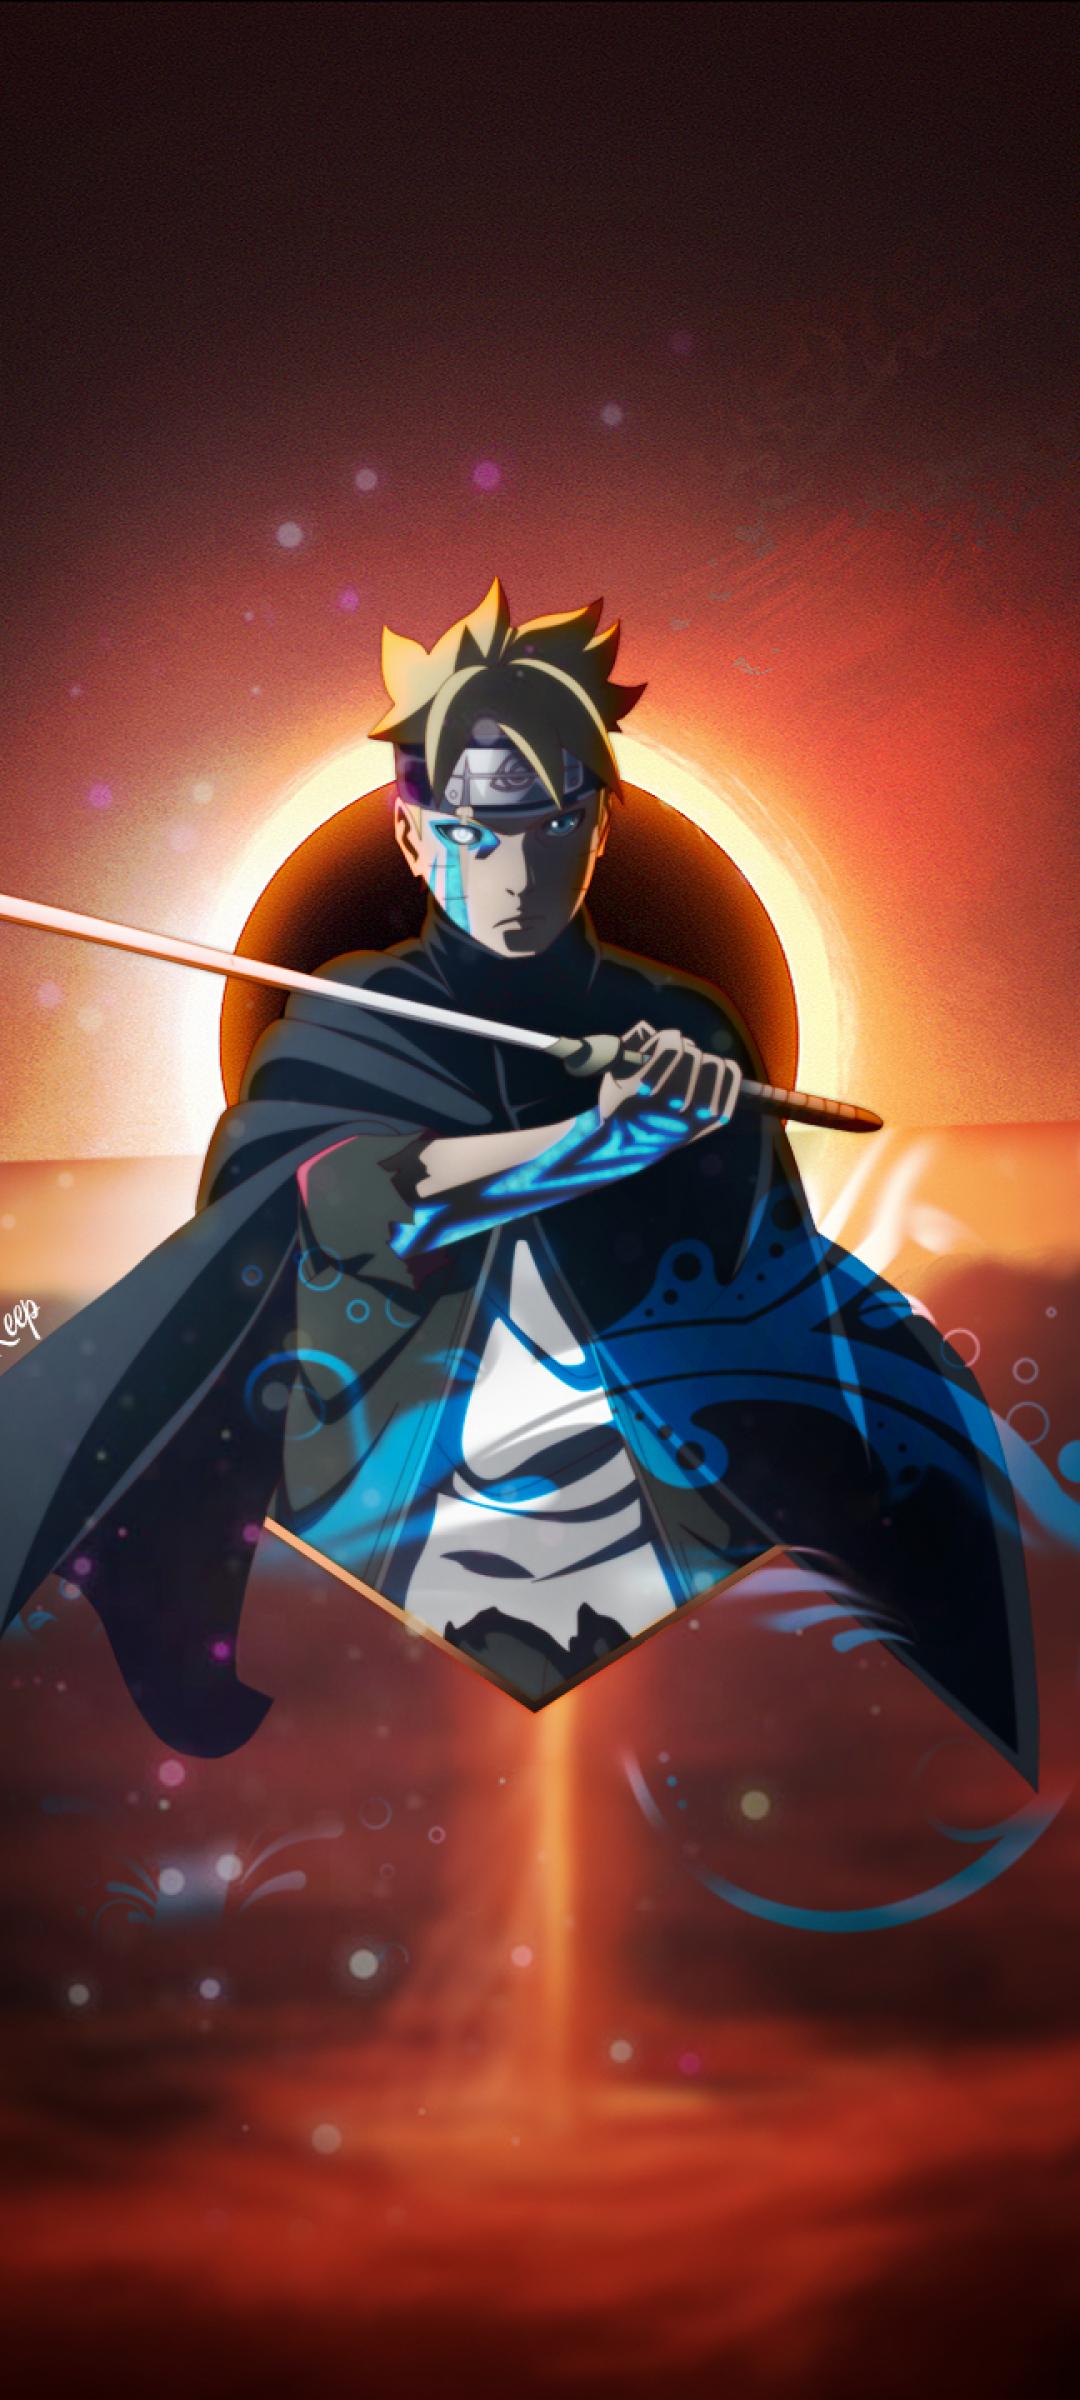 1080x2400 Cool Boruto Uzumaki Art 1080x2400 Resolution Wallpaper, HD Anime 4K Wallpapers, Images ...